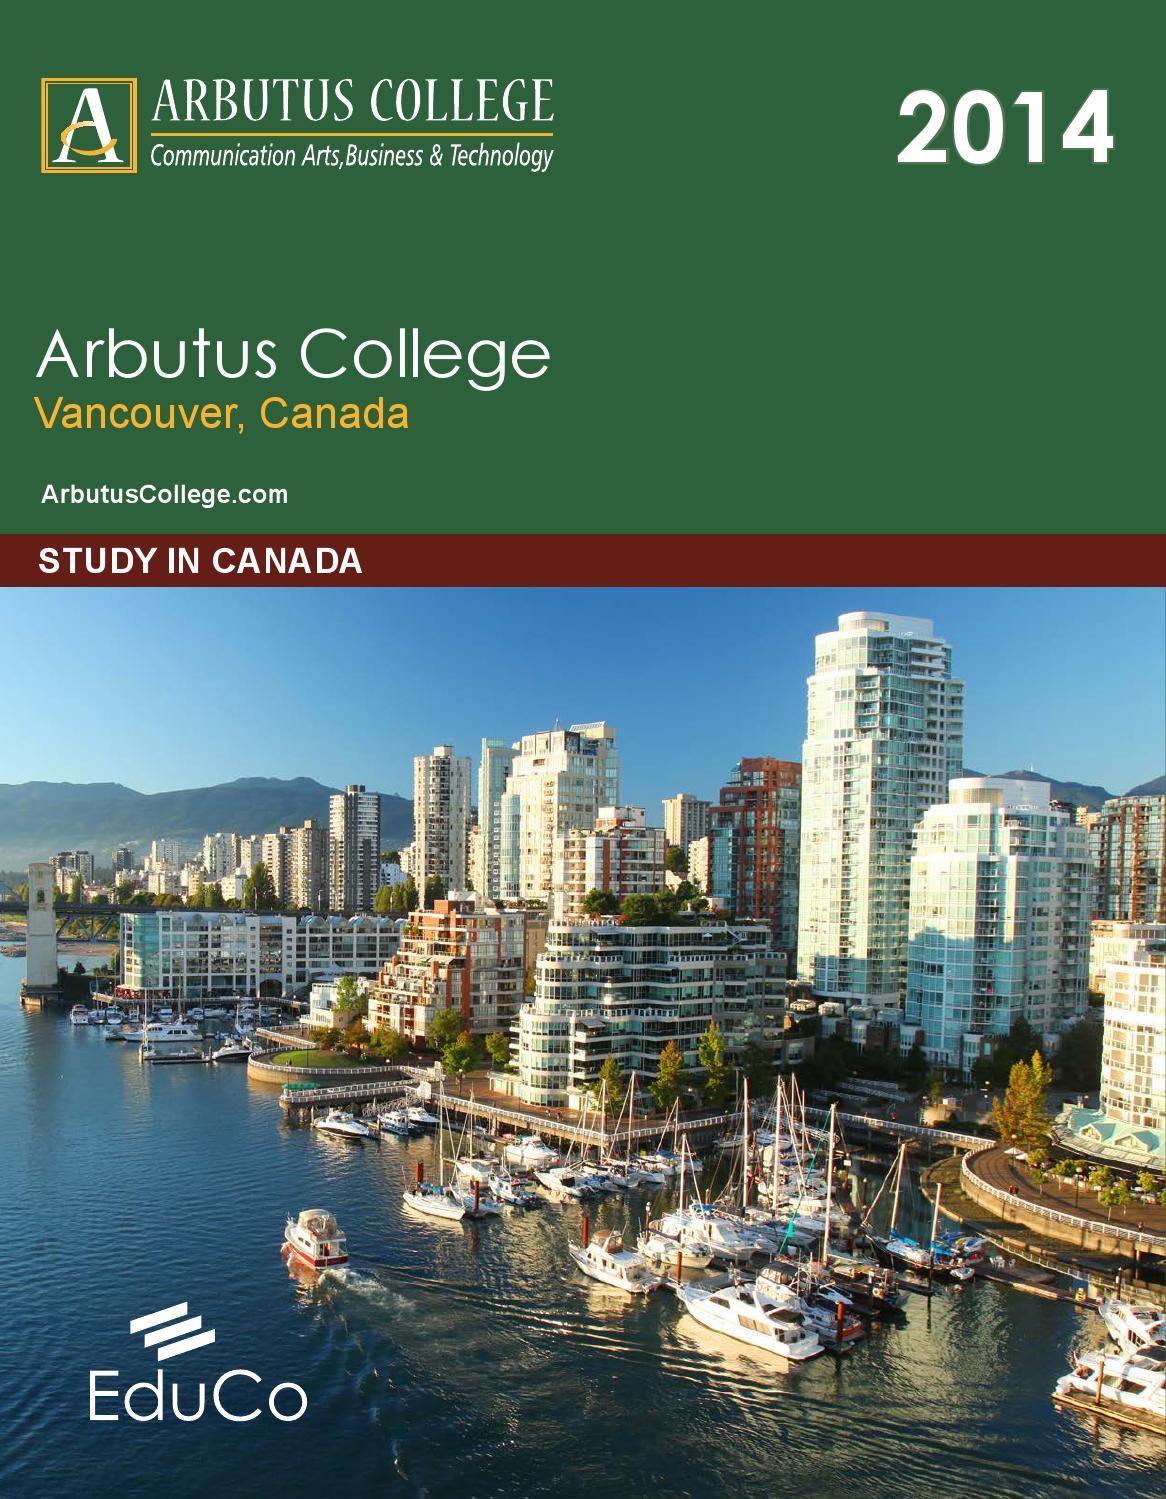 Arbutus College, Vancouver brochure 2014-2015 by Black Ink